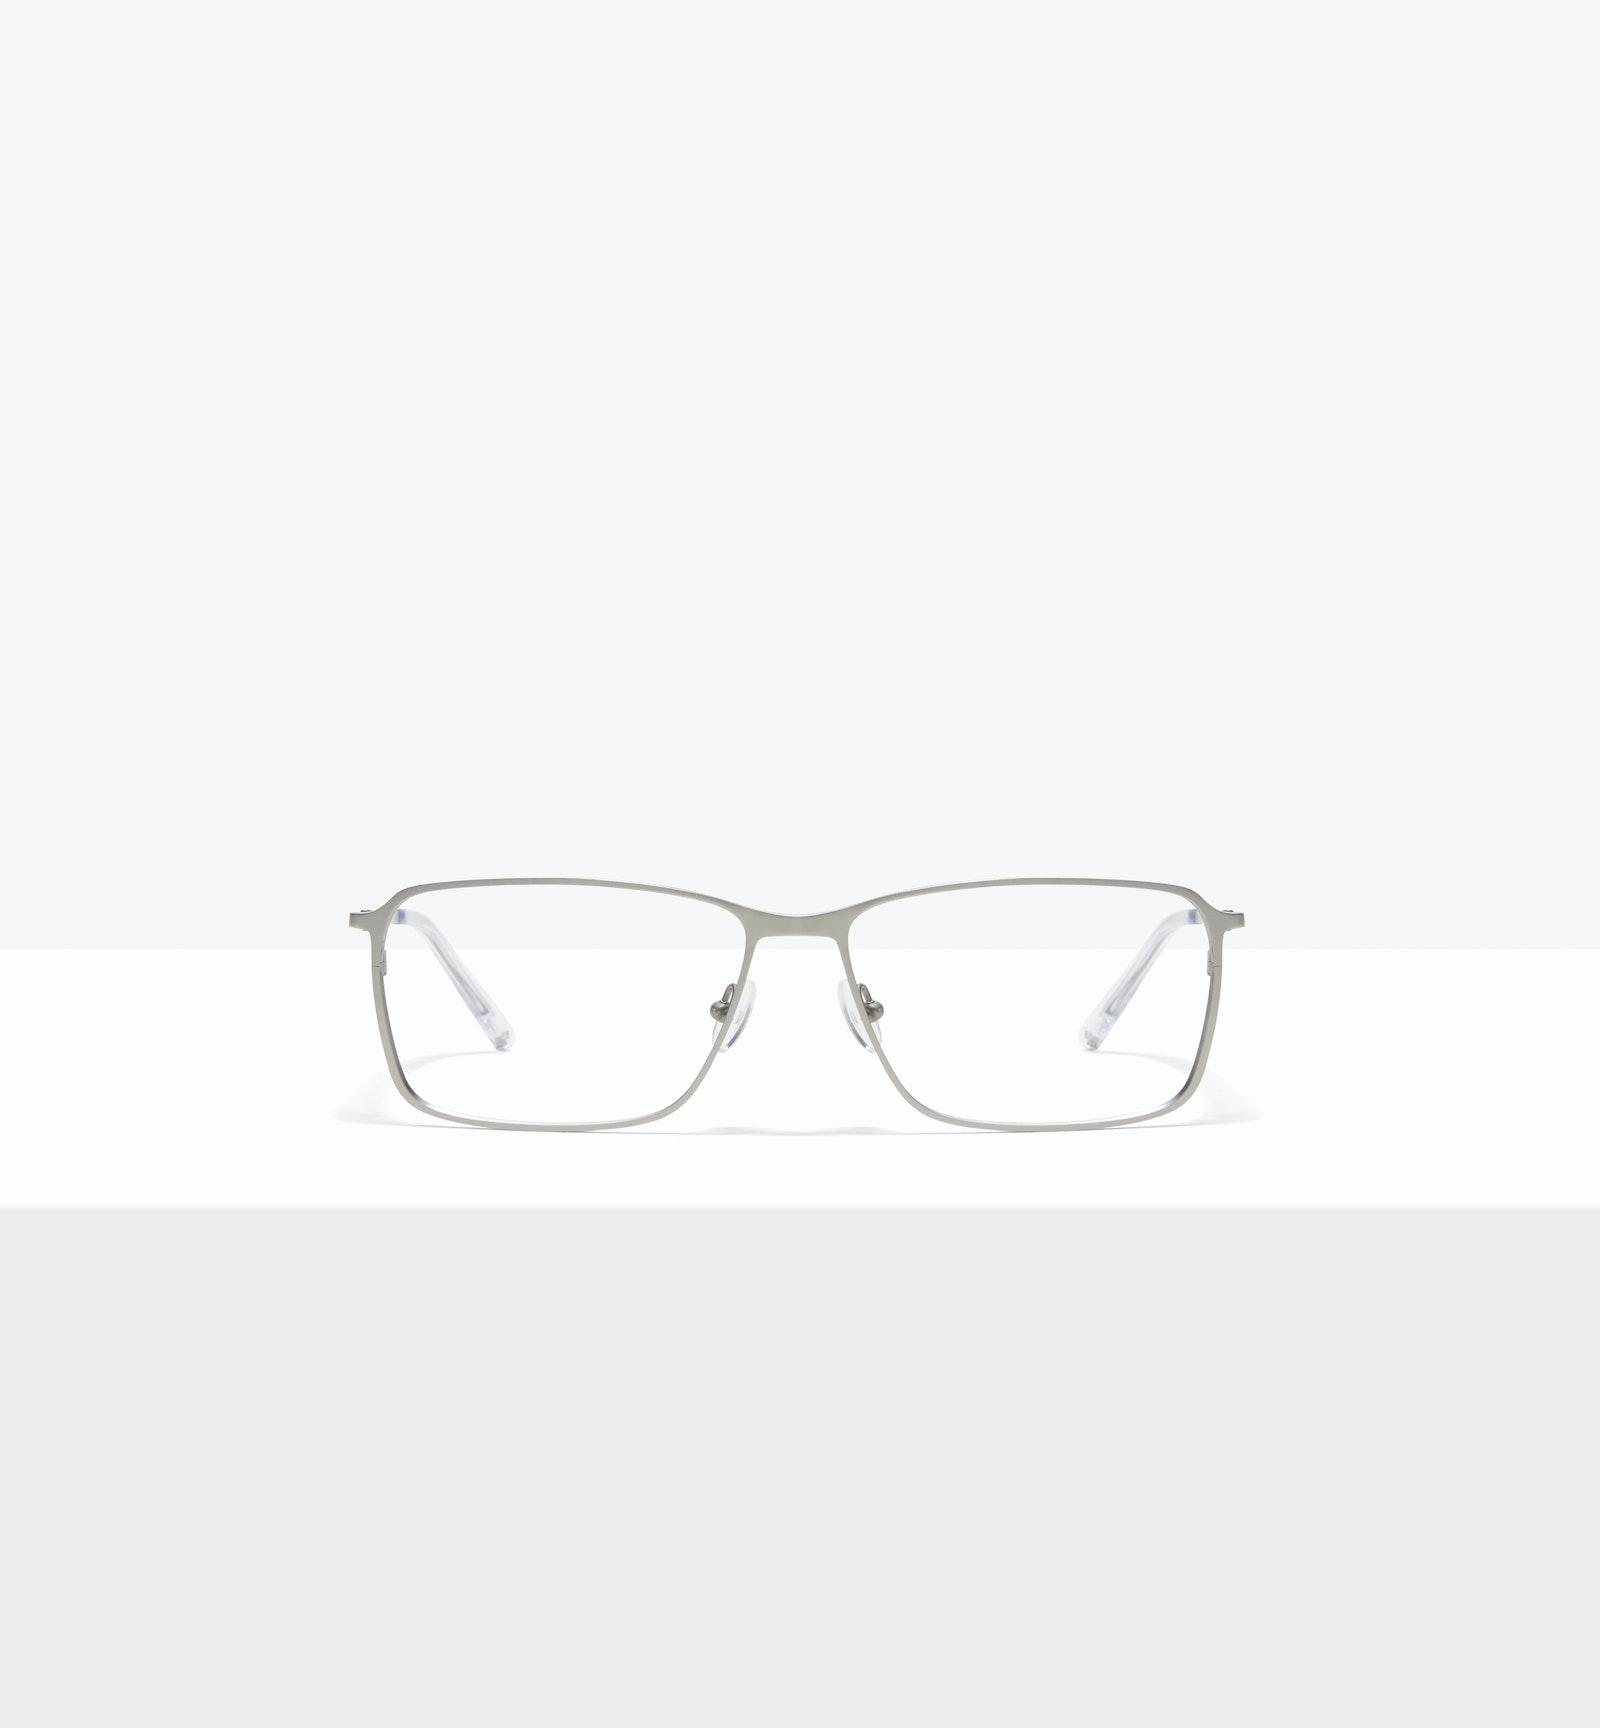 Affordable Fashion Glasses Square Eyeglasses Men Drive Silver